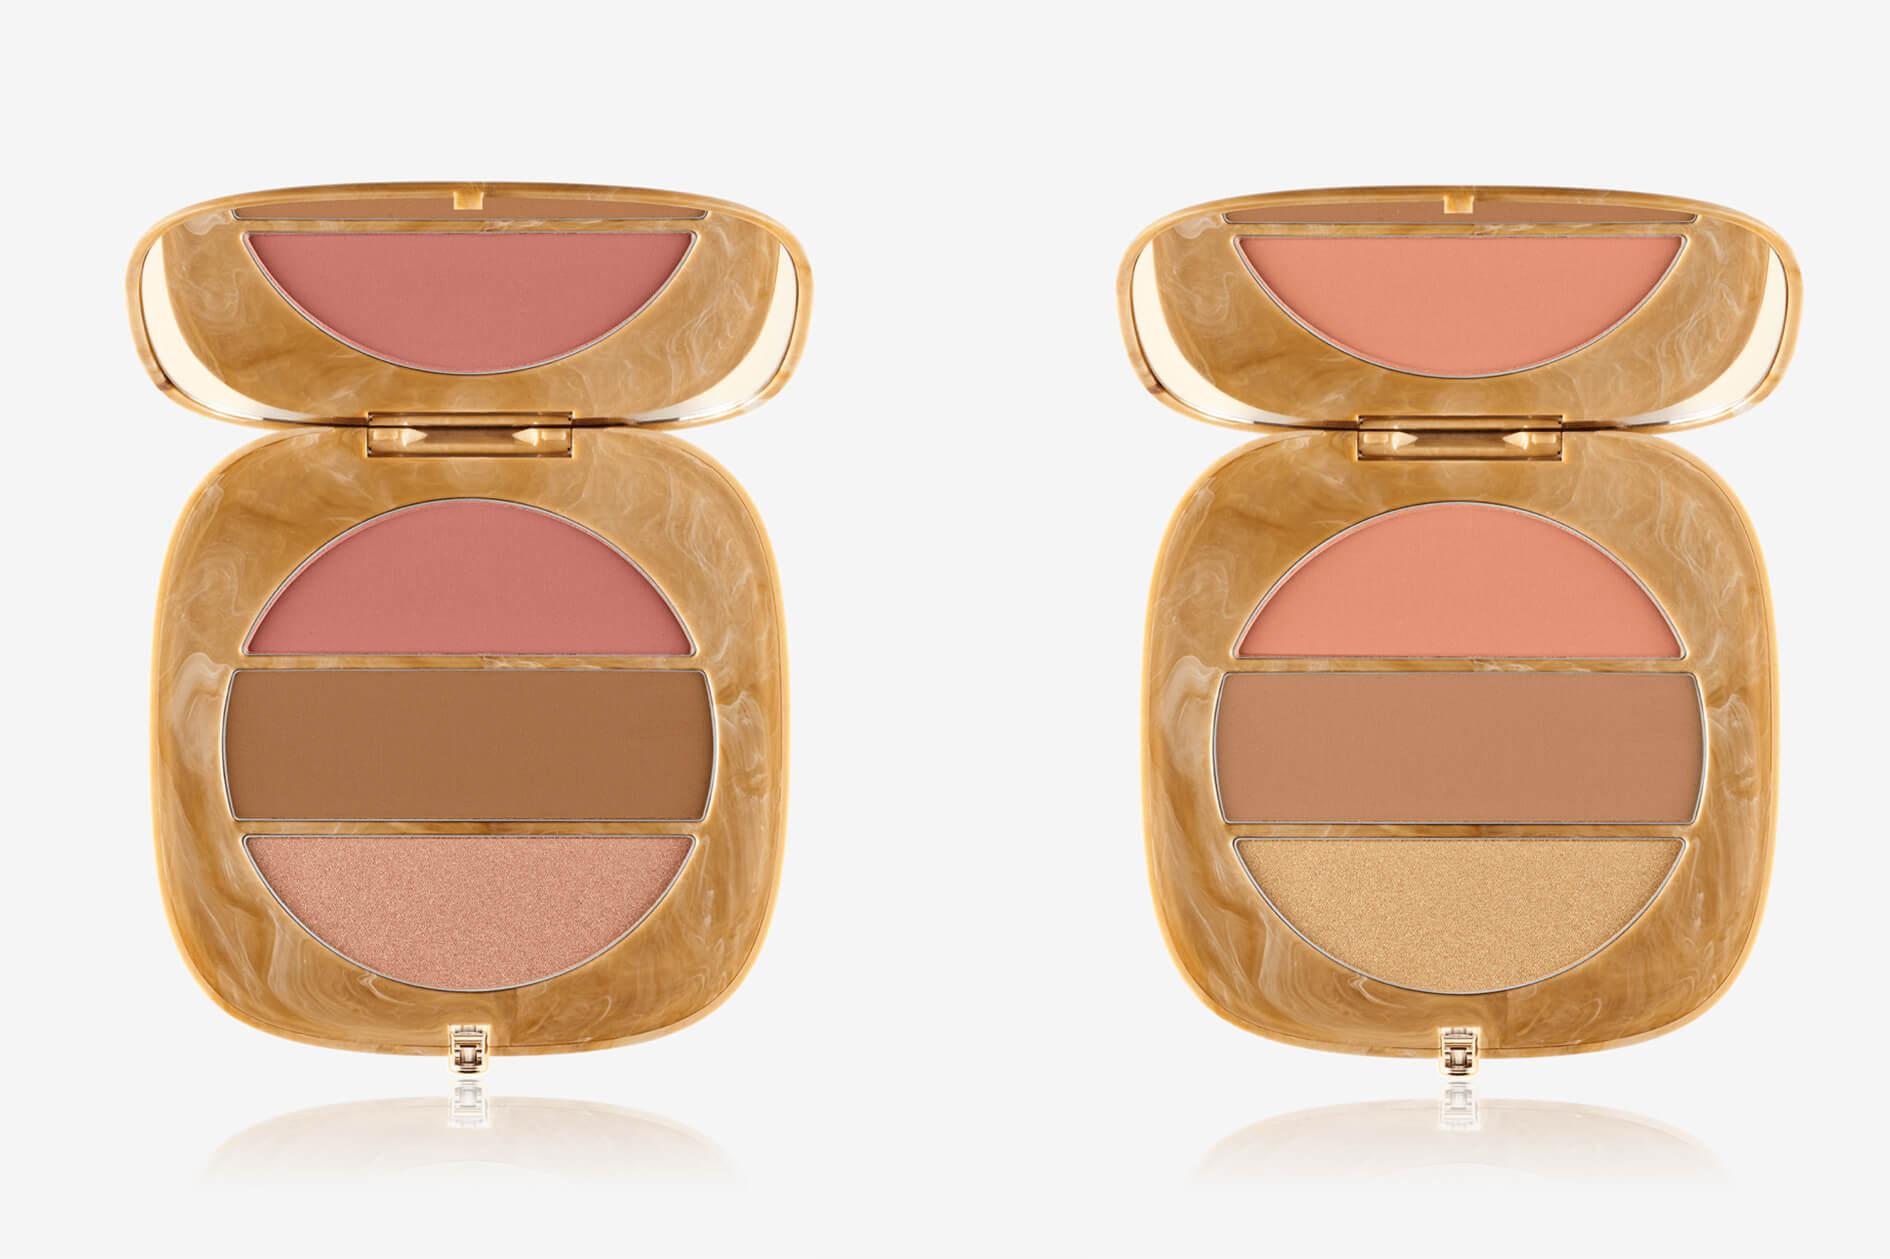 OMega Three Powder Blush Bronze Highlight Palette